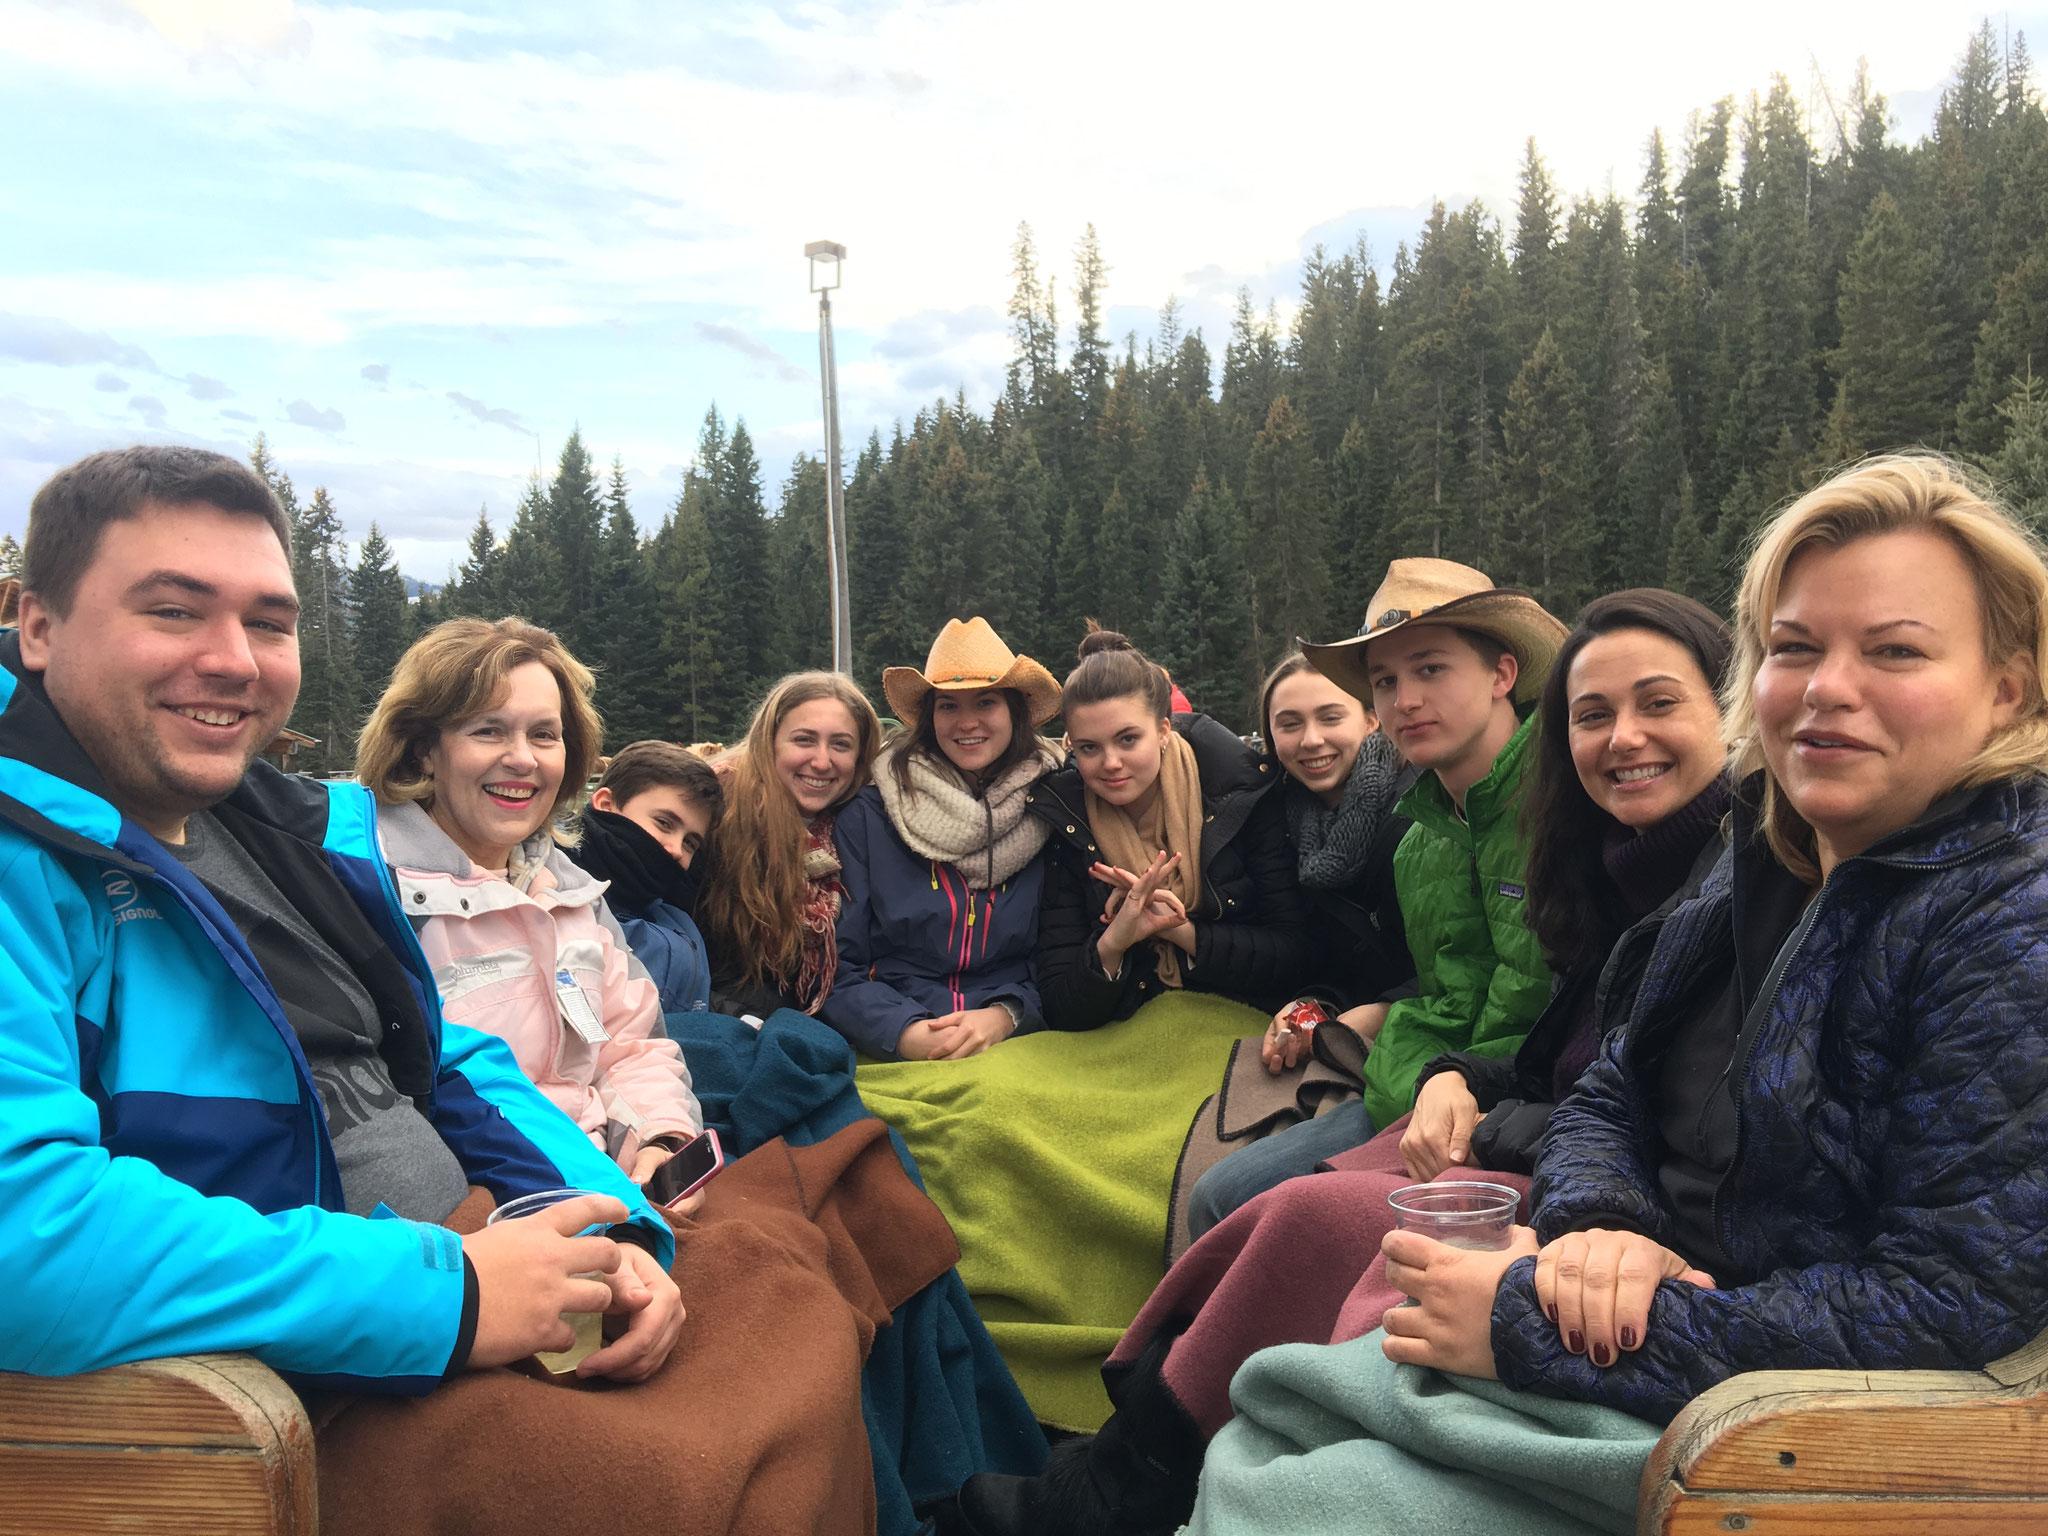 Group Sleighride, Big Sky, Montana, March, 2017